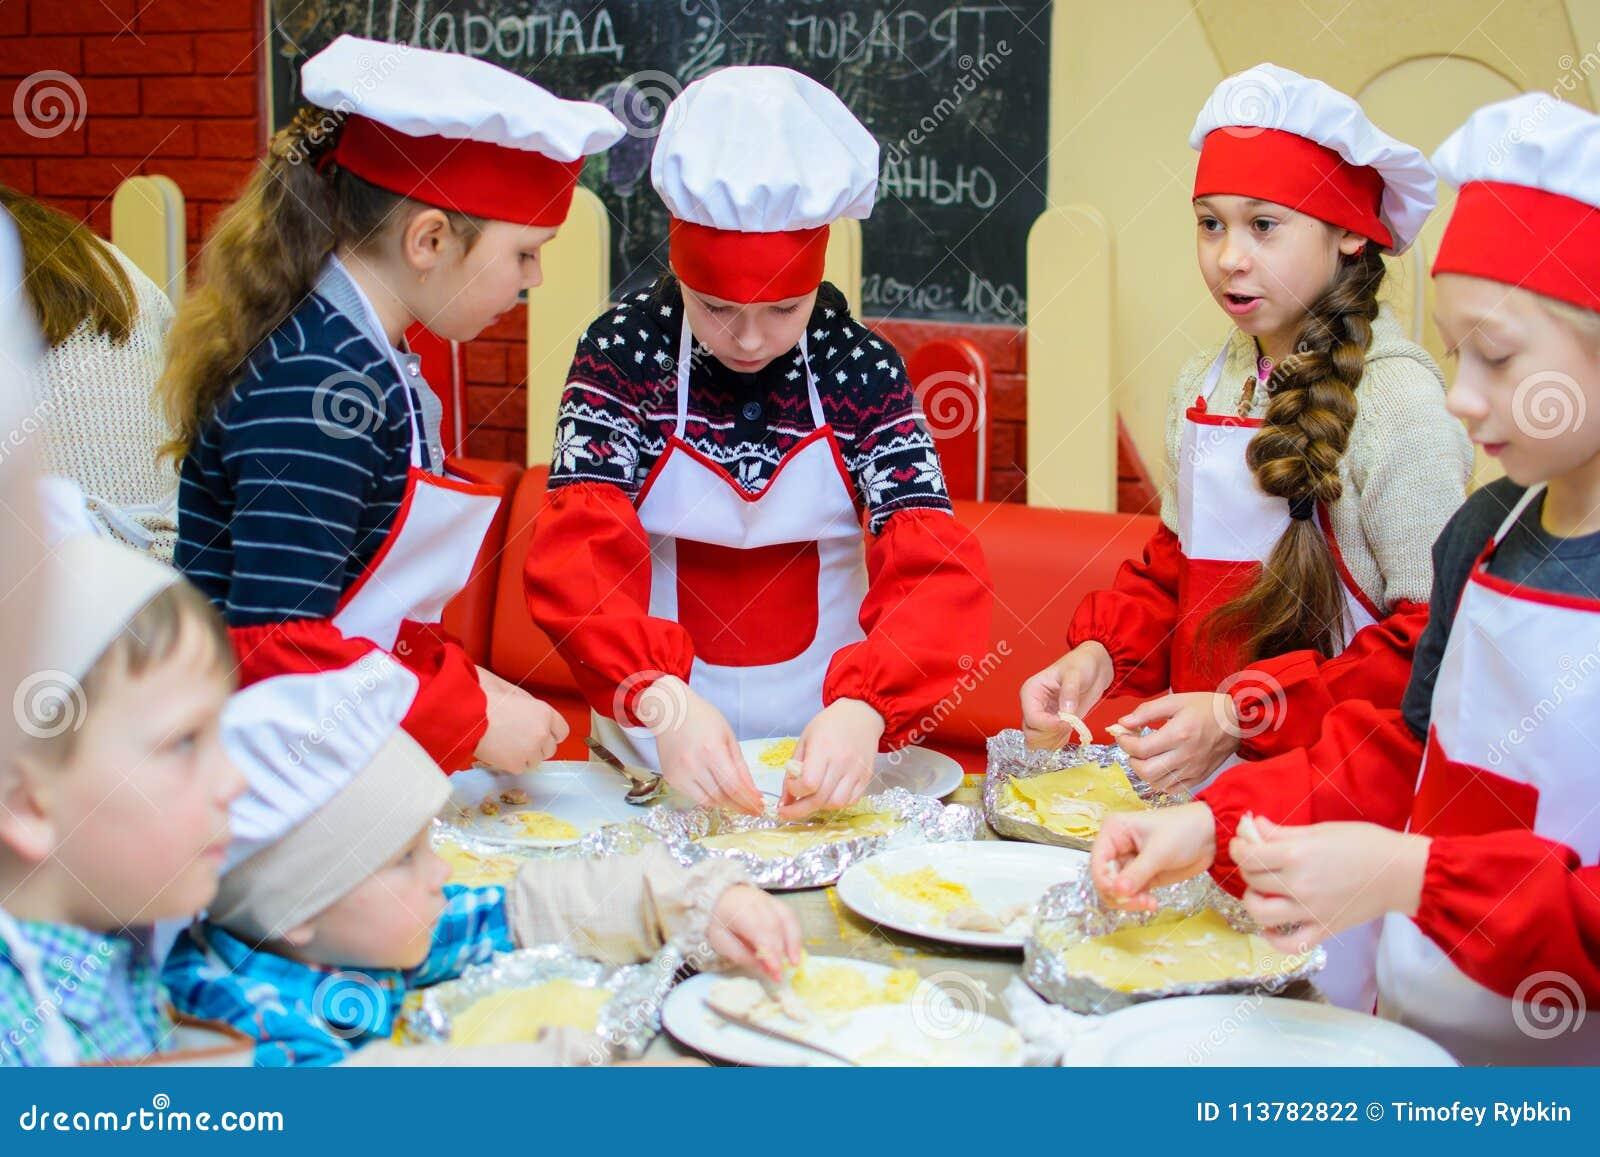 Alchevsk, Ουκρανία - 21 Ιανουαρίου 2018: Τα παιδιά υπό μορφή μαγείρων μαθαίνουν πώς να μαγειρεψουν το lasagna